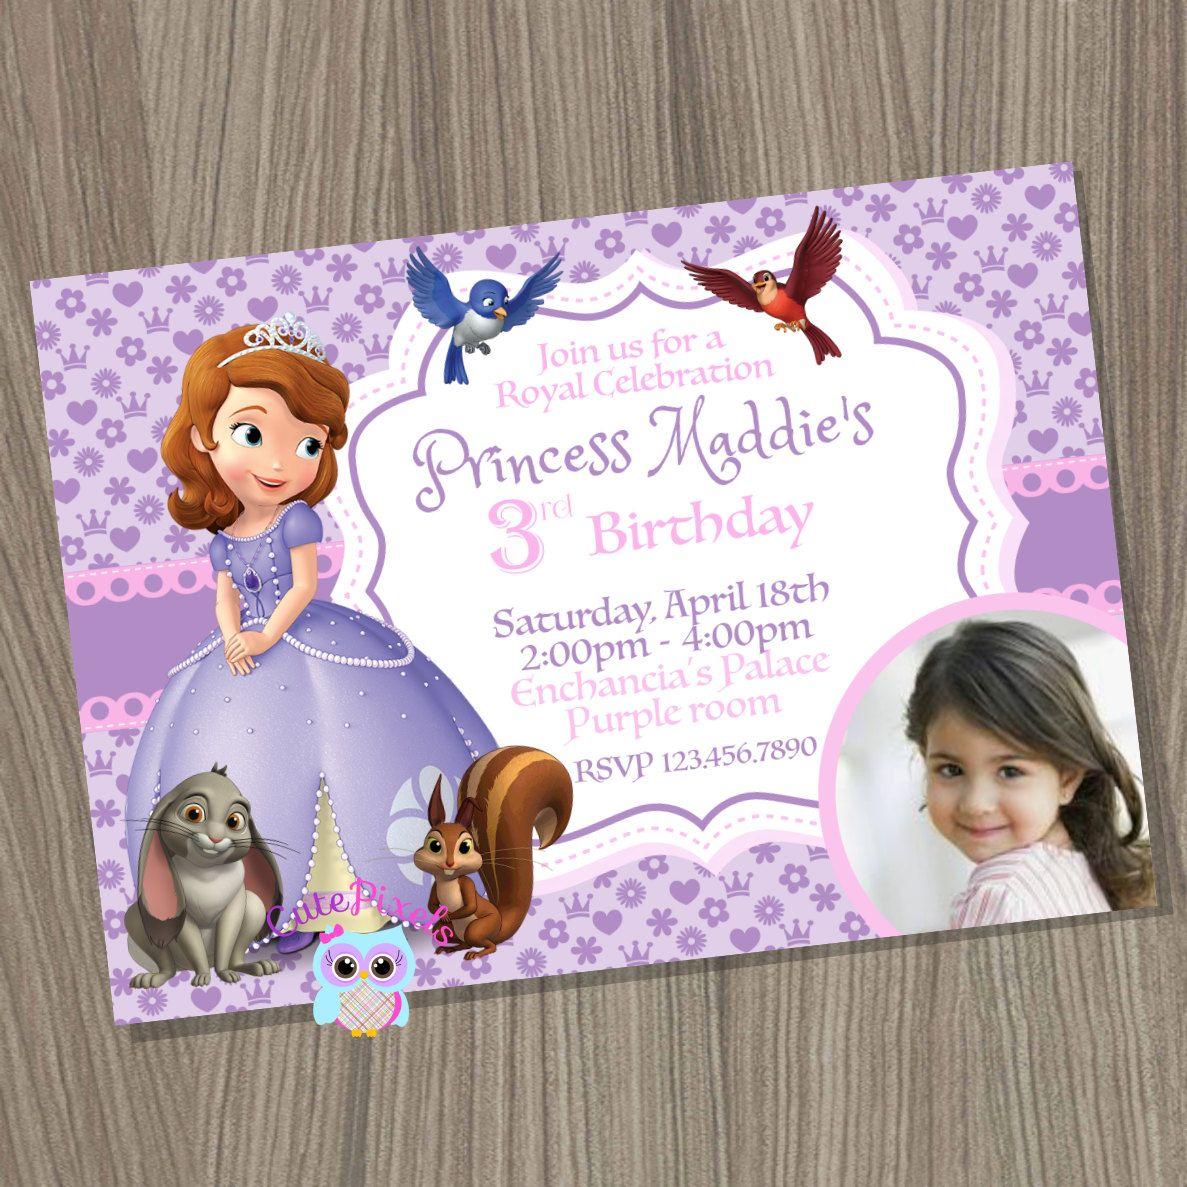 Sofia the first invitation Princess Sofia Invitation | aniversário ...